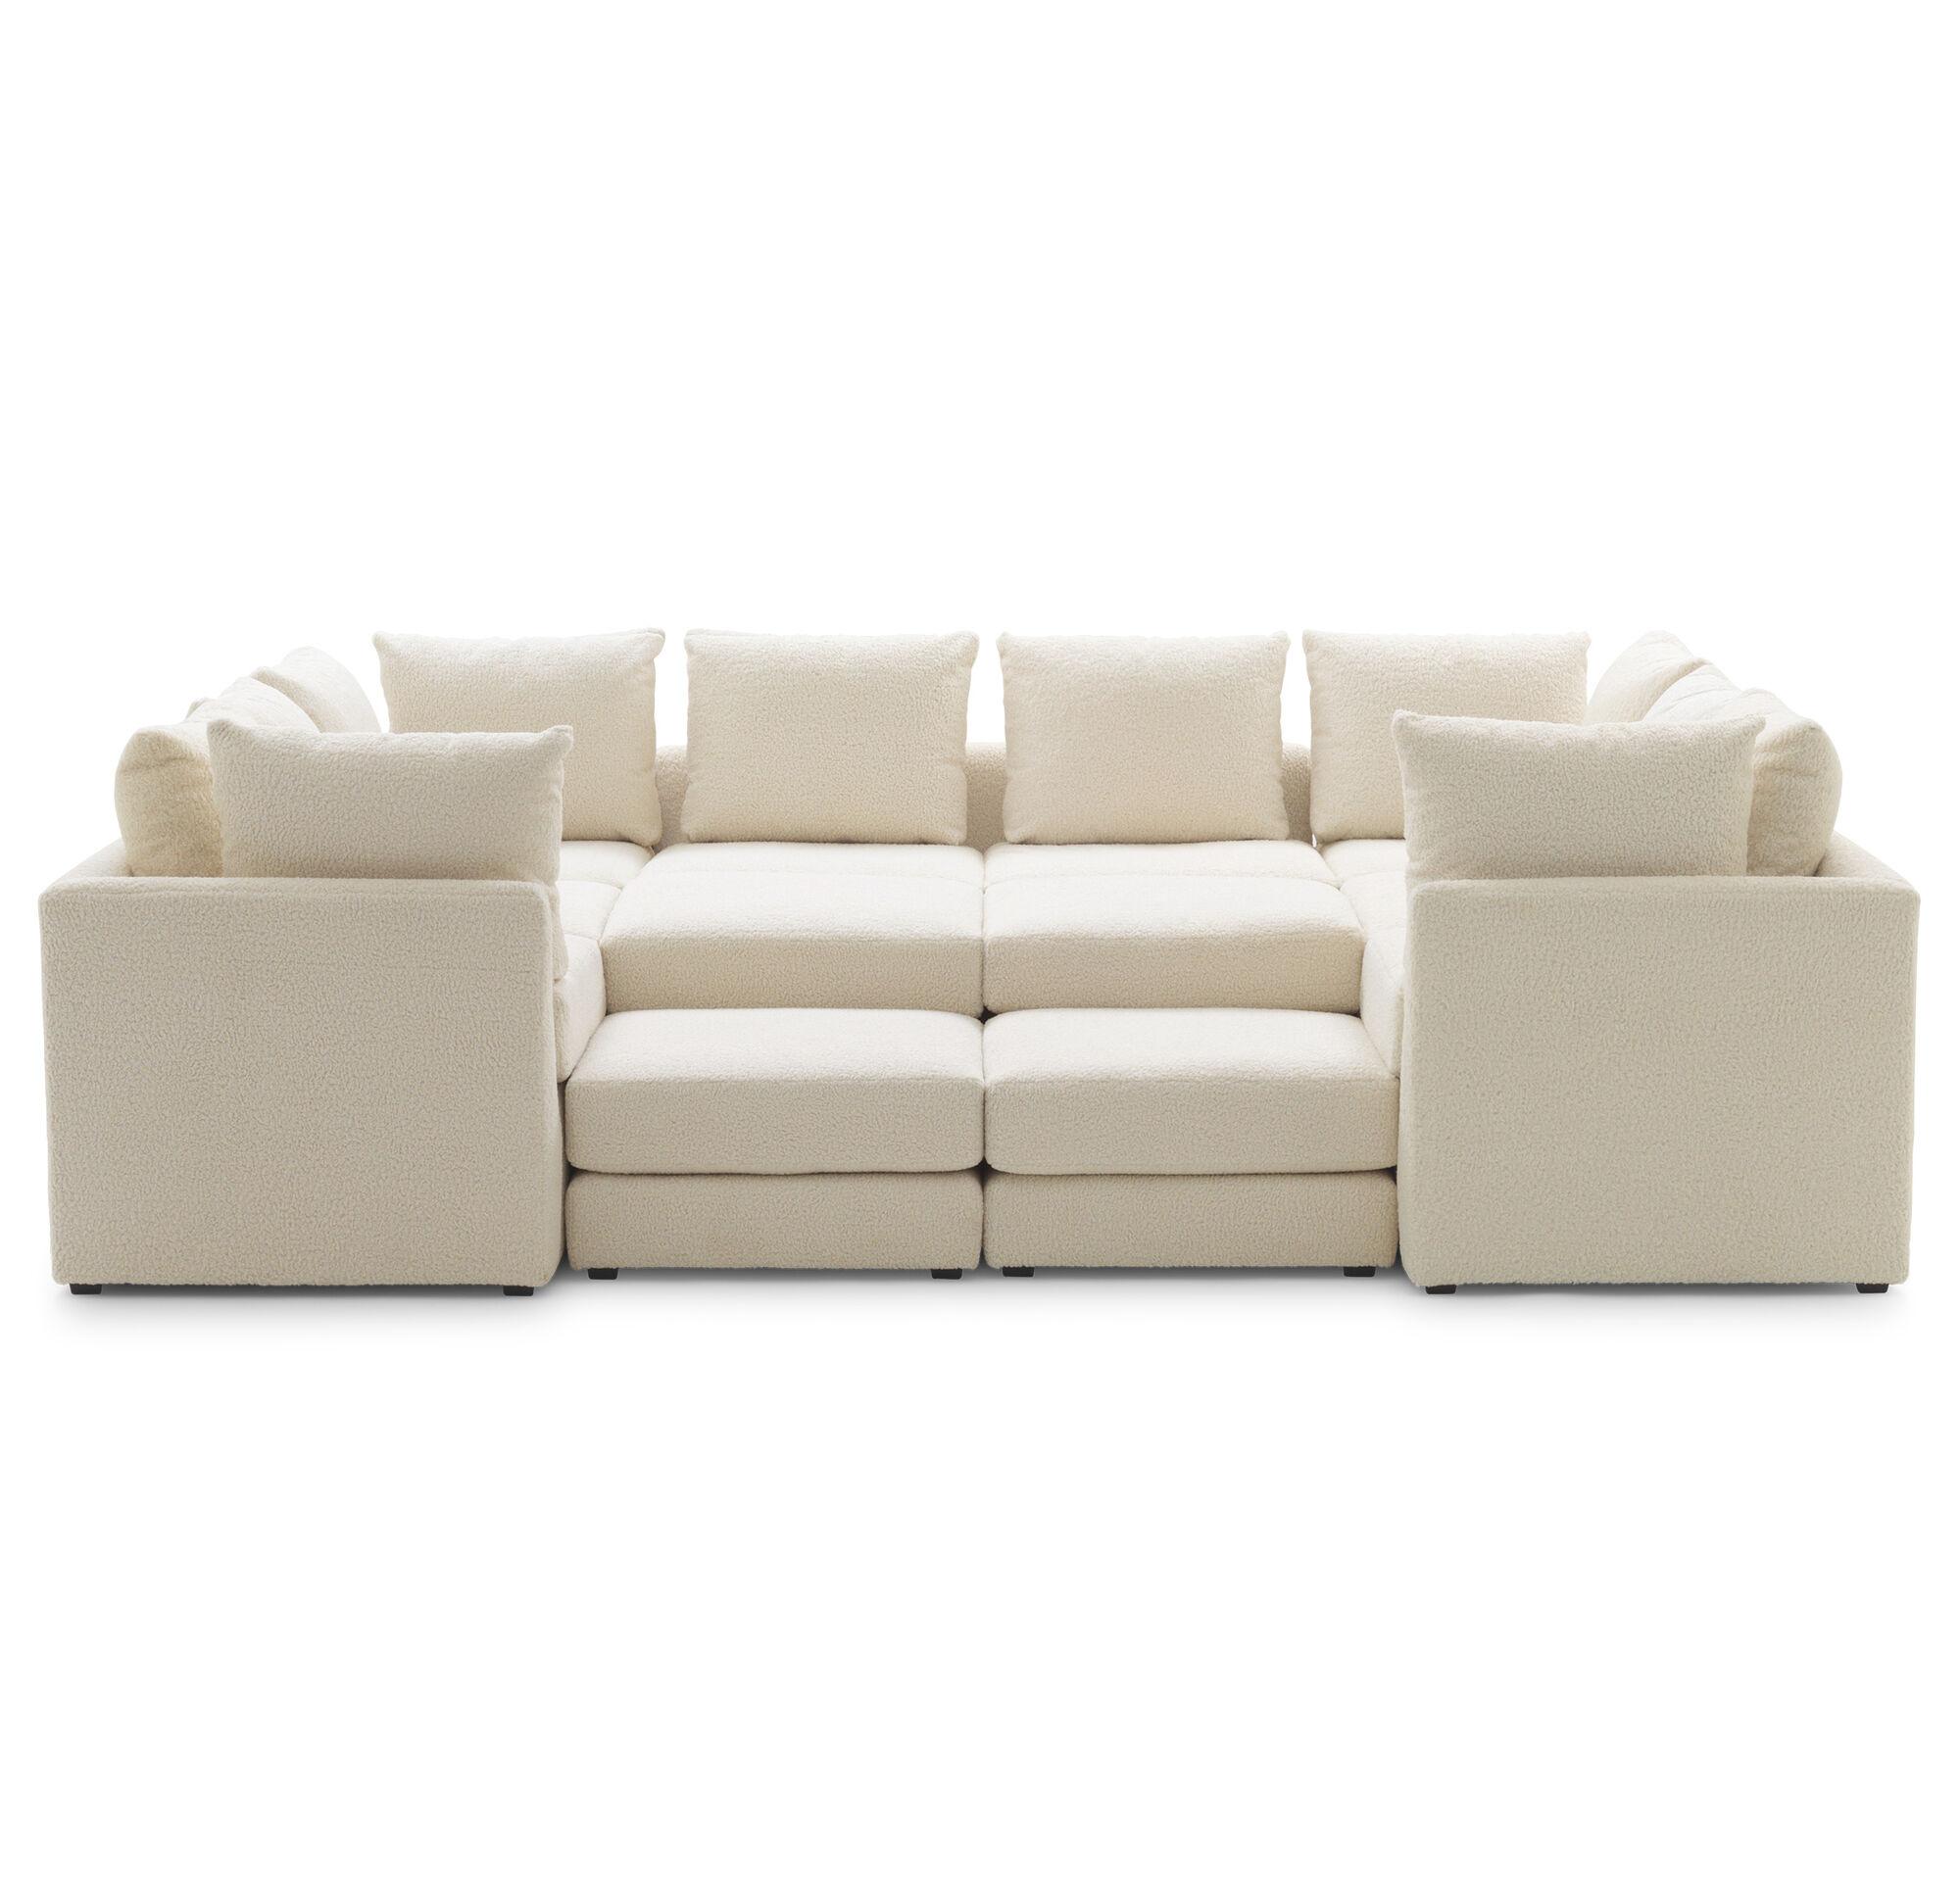 Pitt 7 pc sectional sofa sherpa natural